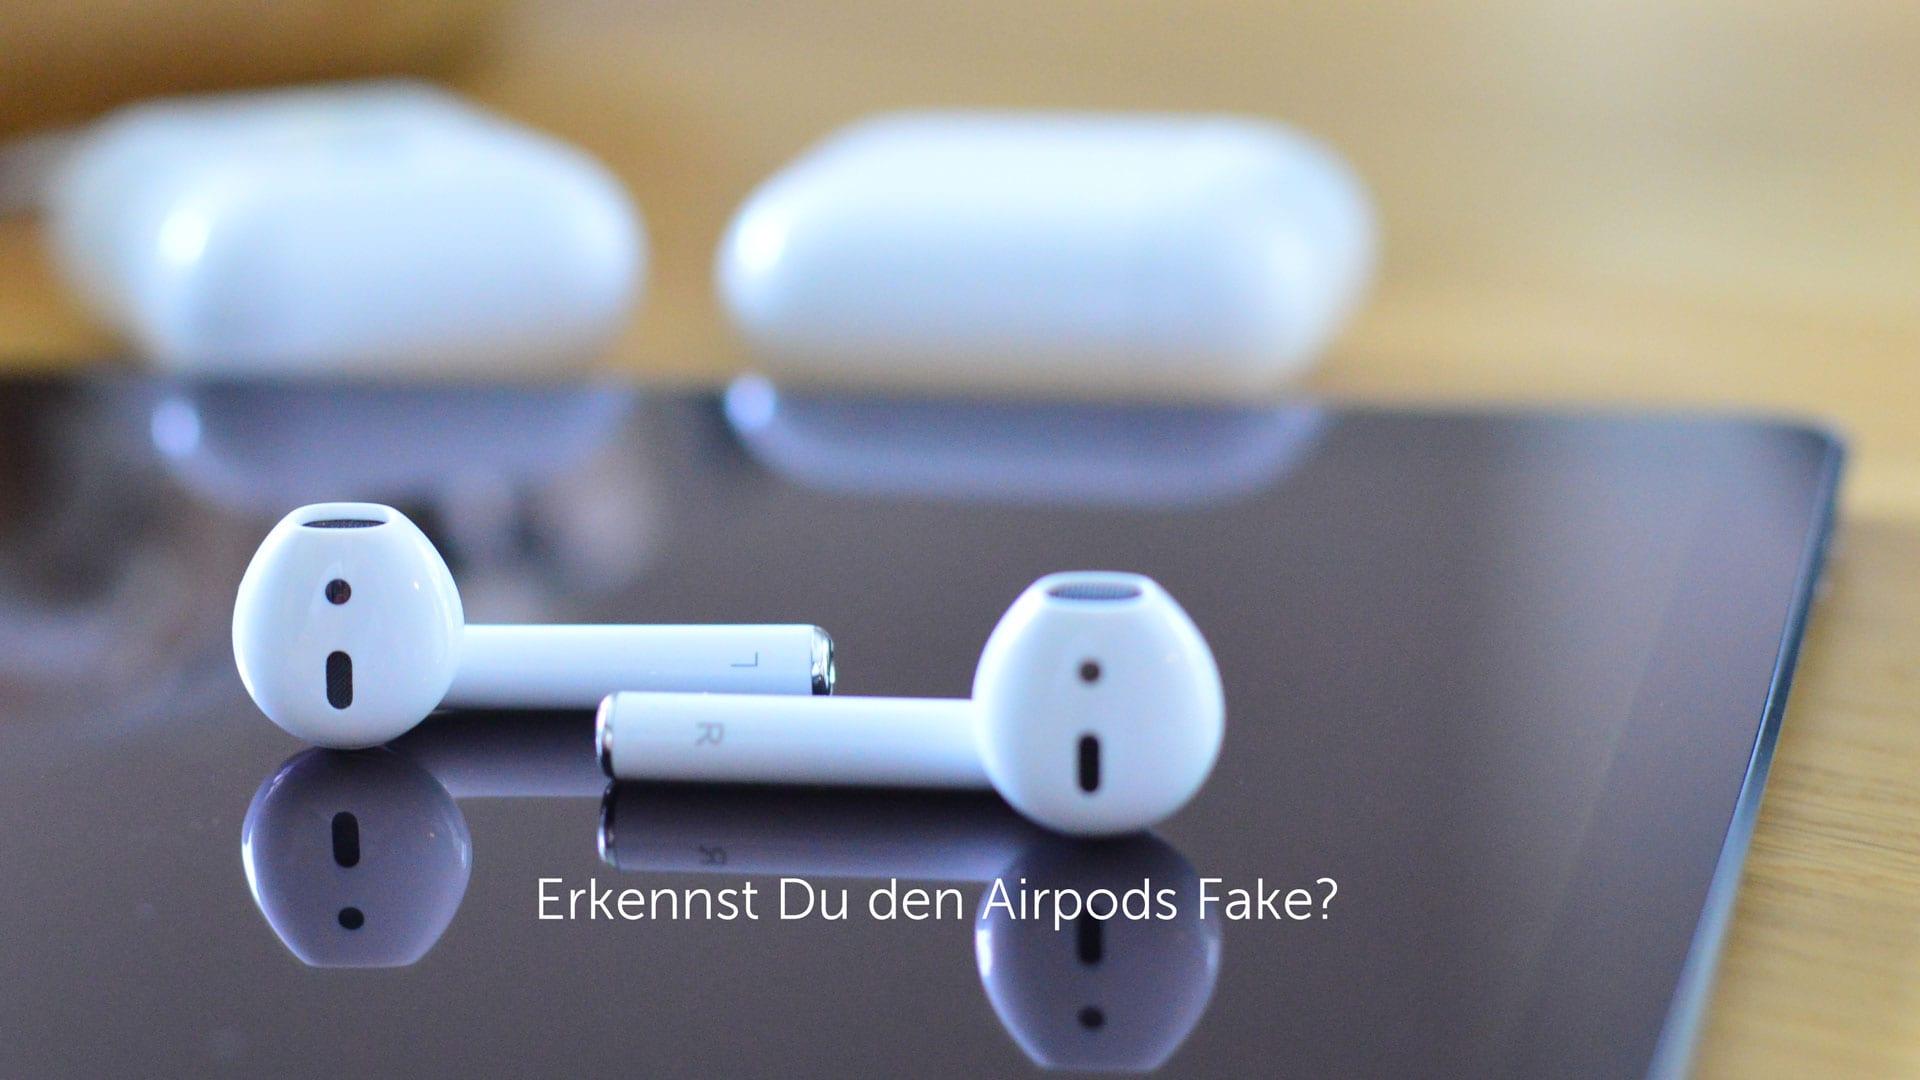 Airpods Fake – lohnt sich ein Airpods Clone?